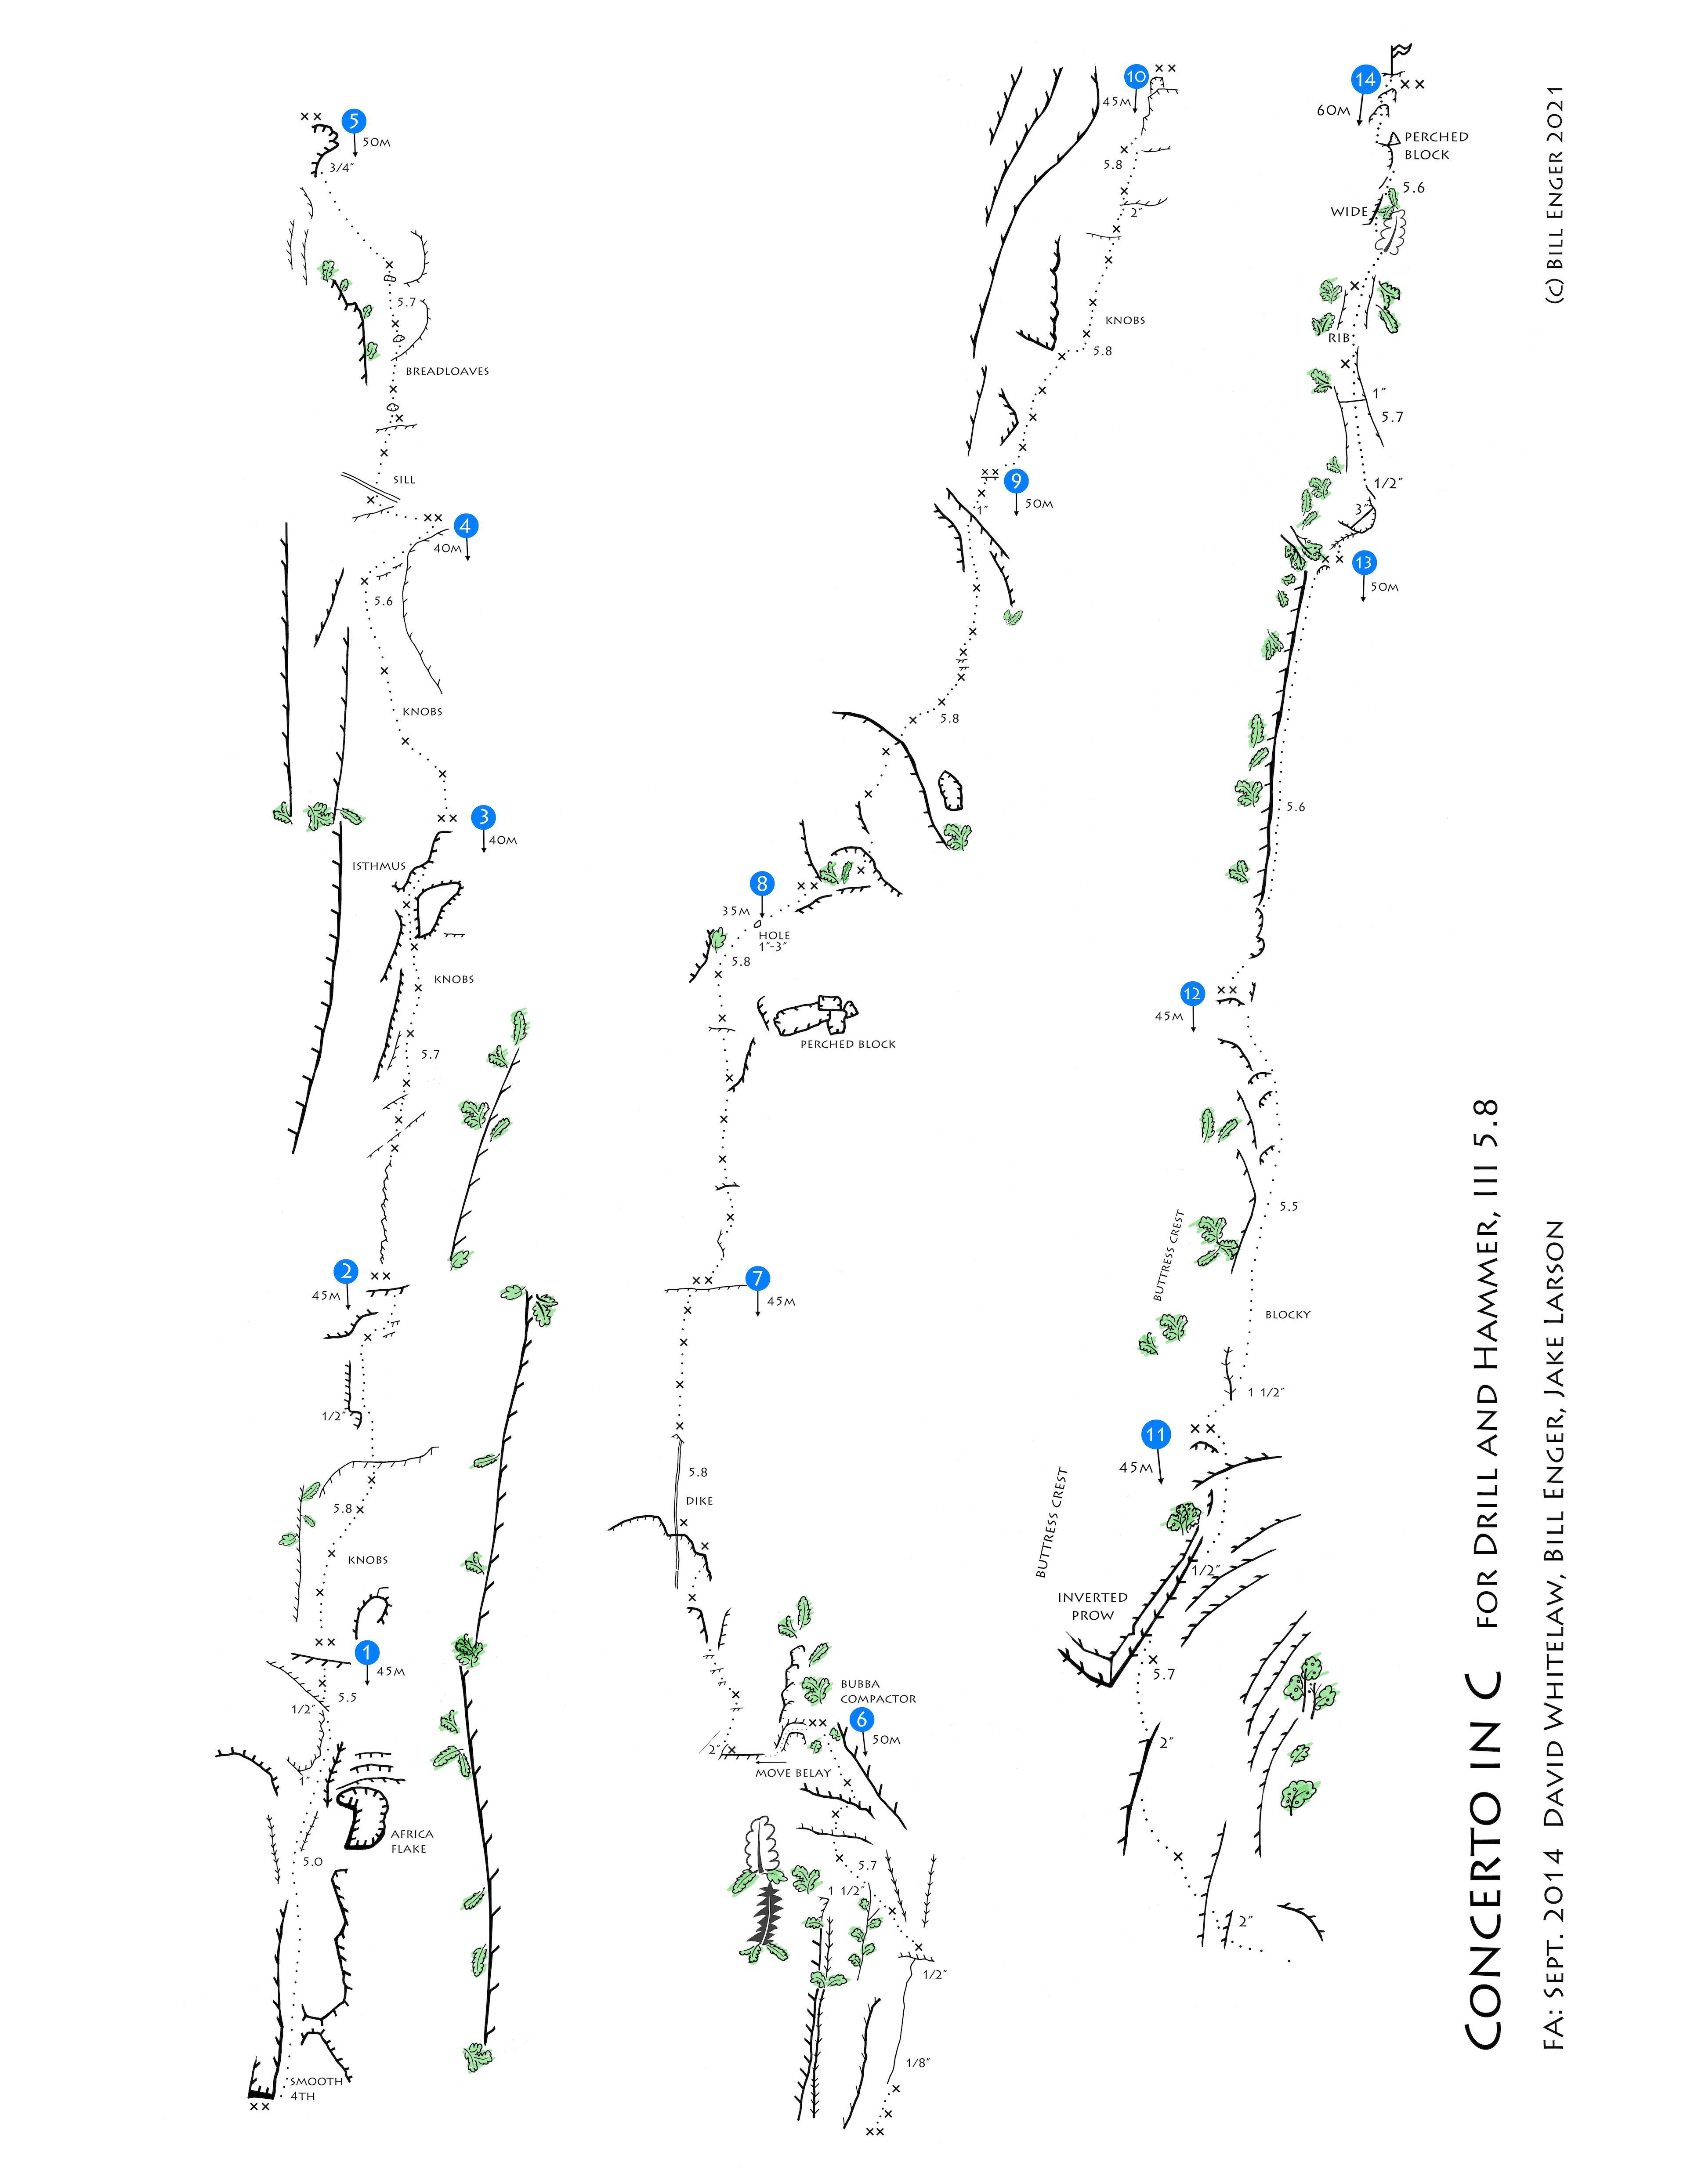 ConcertoInC_rev1.jpg.fbdf1e129e58d97c018fafd216ab95b6.jpg